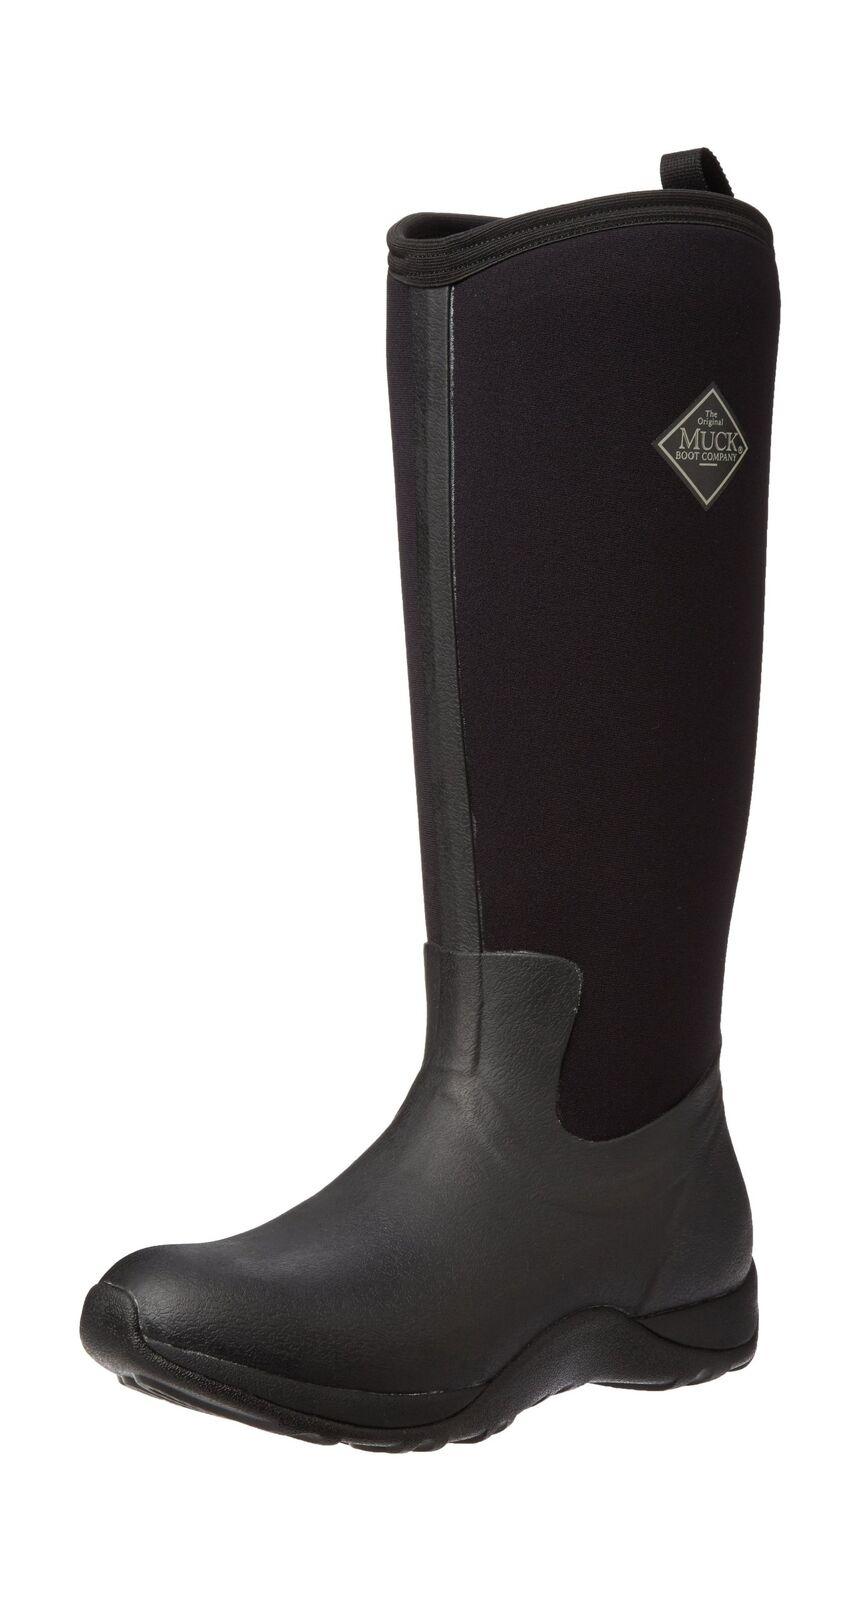 Muck Boots Arctic Adventure, Women's Rain Boots Black (Black) 7 UK